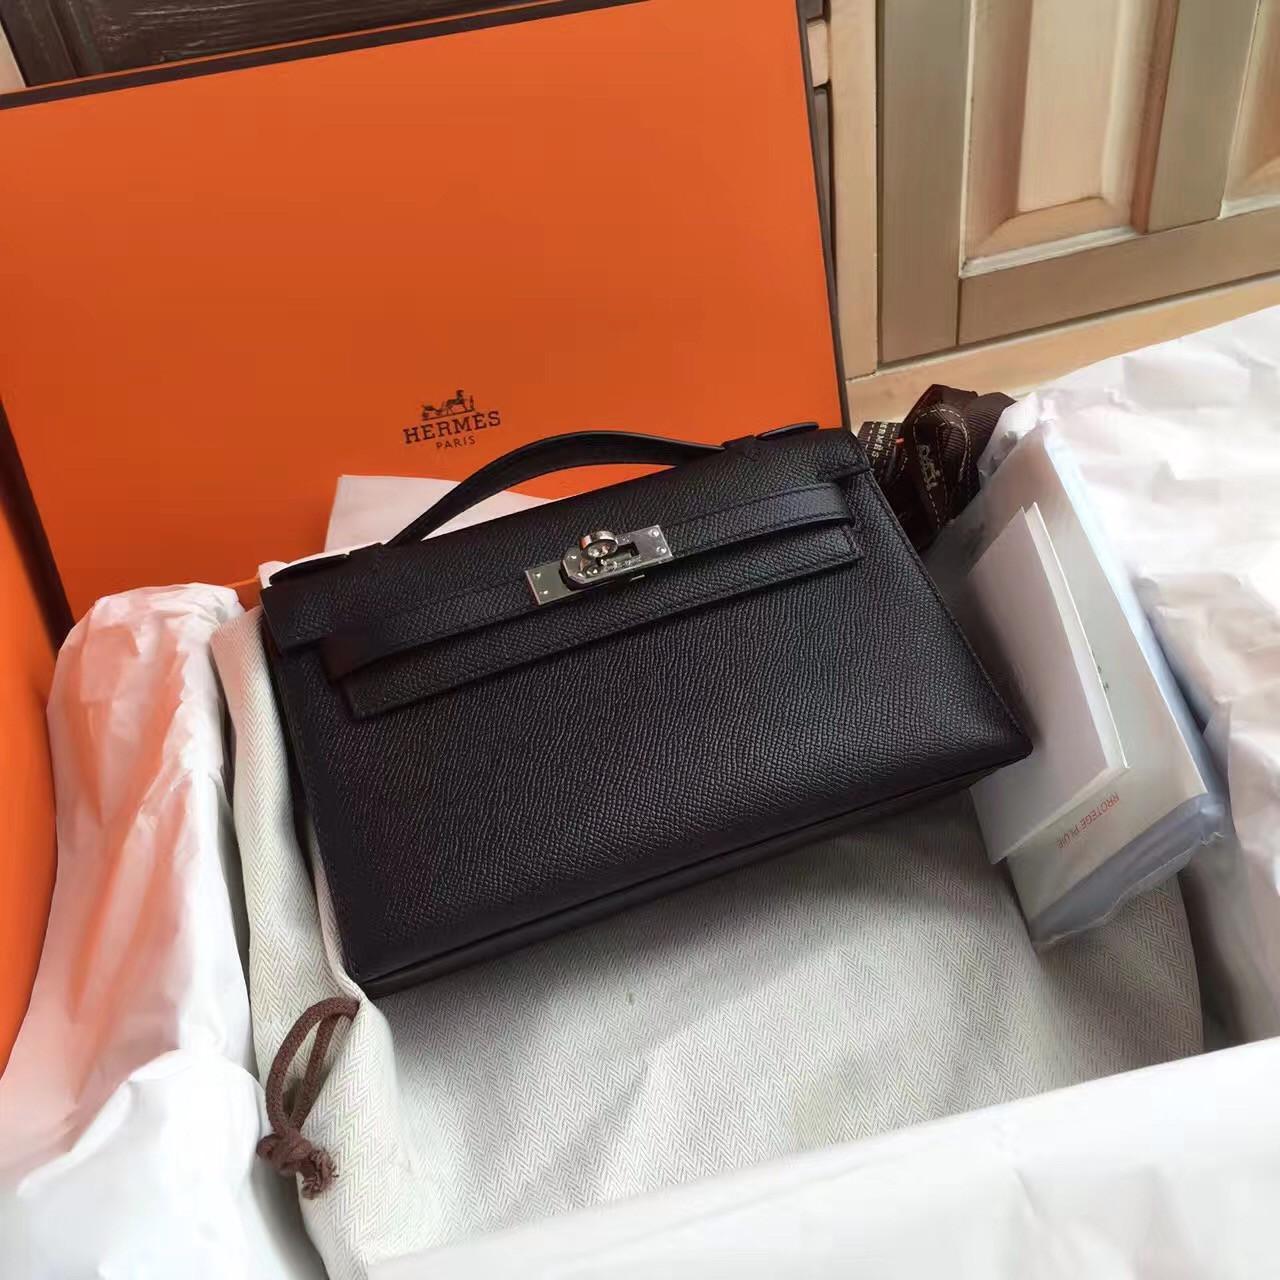 adbf0400c7cd Hermès Black Mini Kelly Pochette Epsom leather Palladium hardware